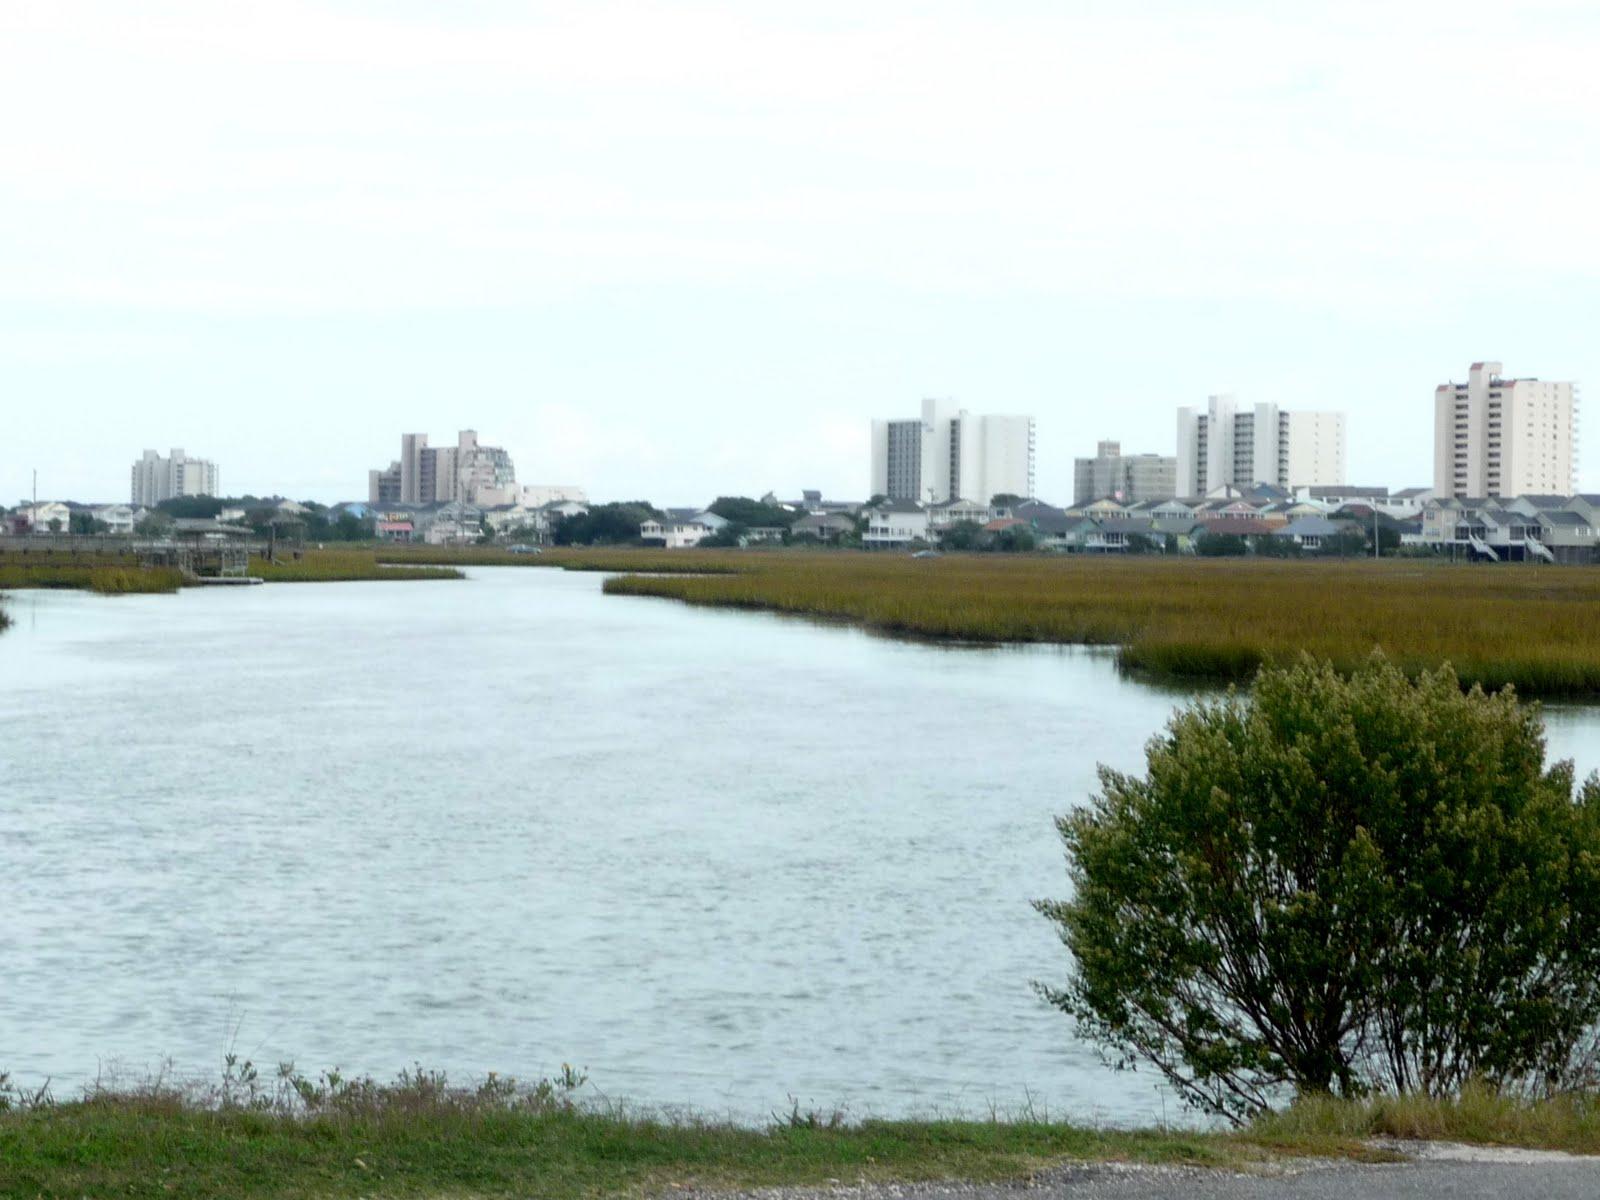 Seniors Walking Across America Post 479 Day 273 16 Georgetown Garden City Beach So